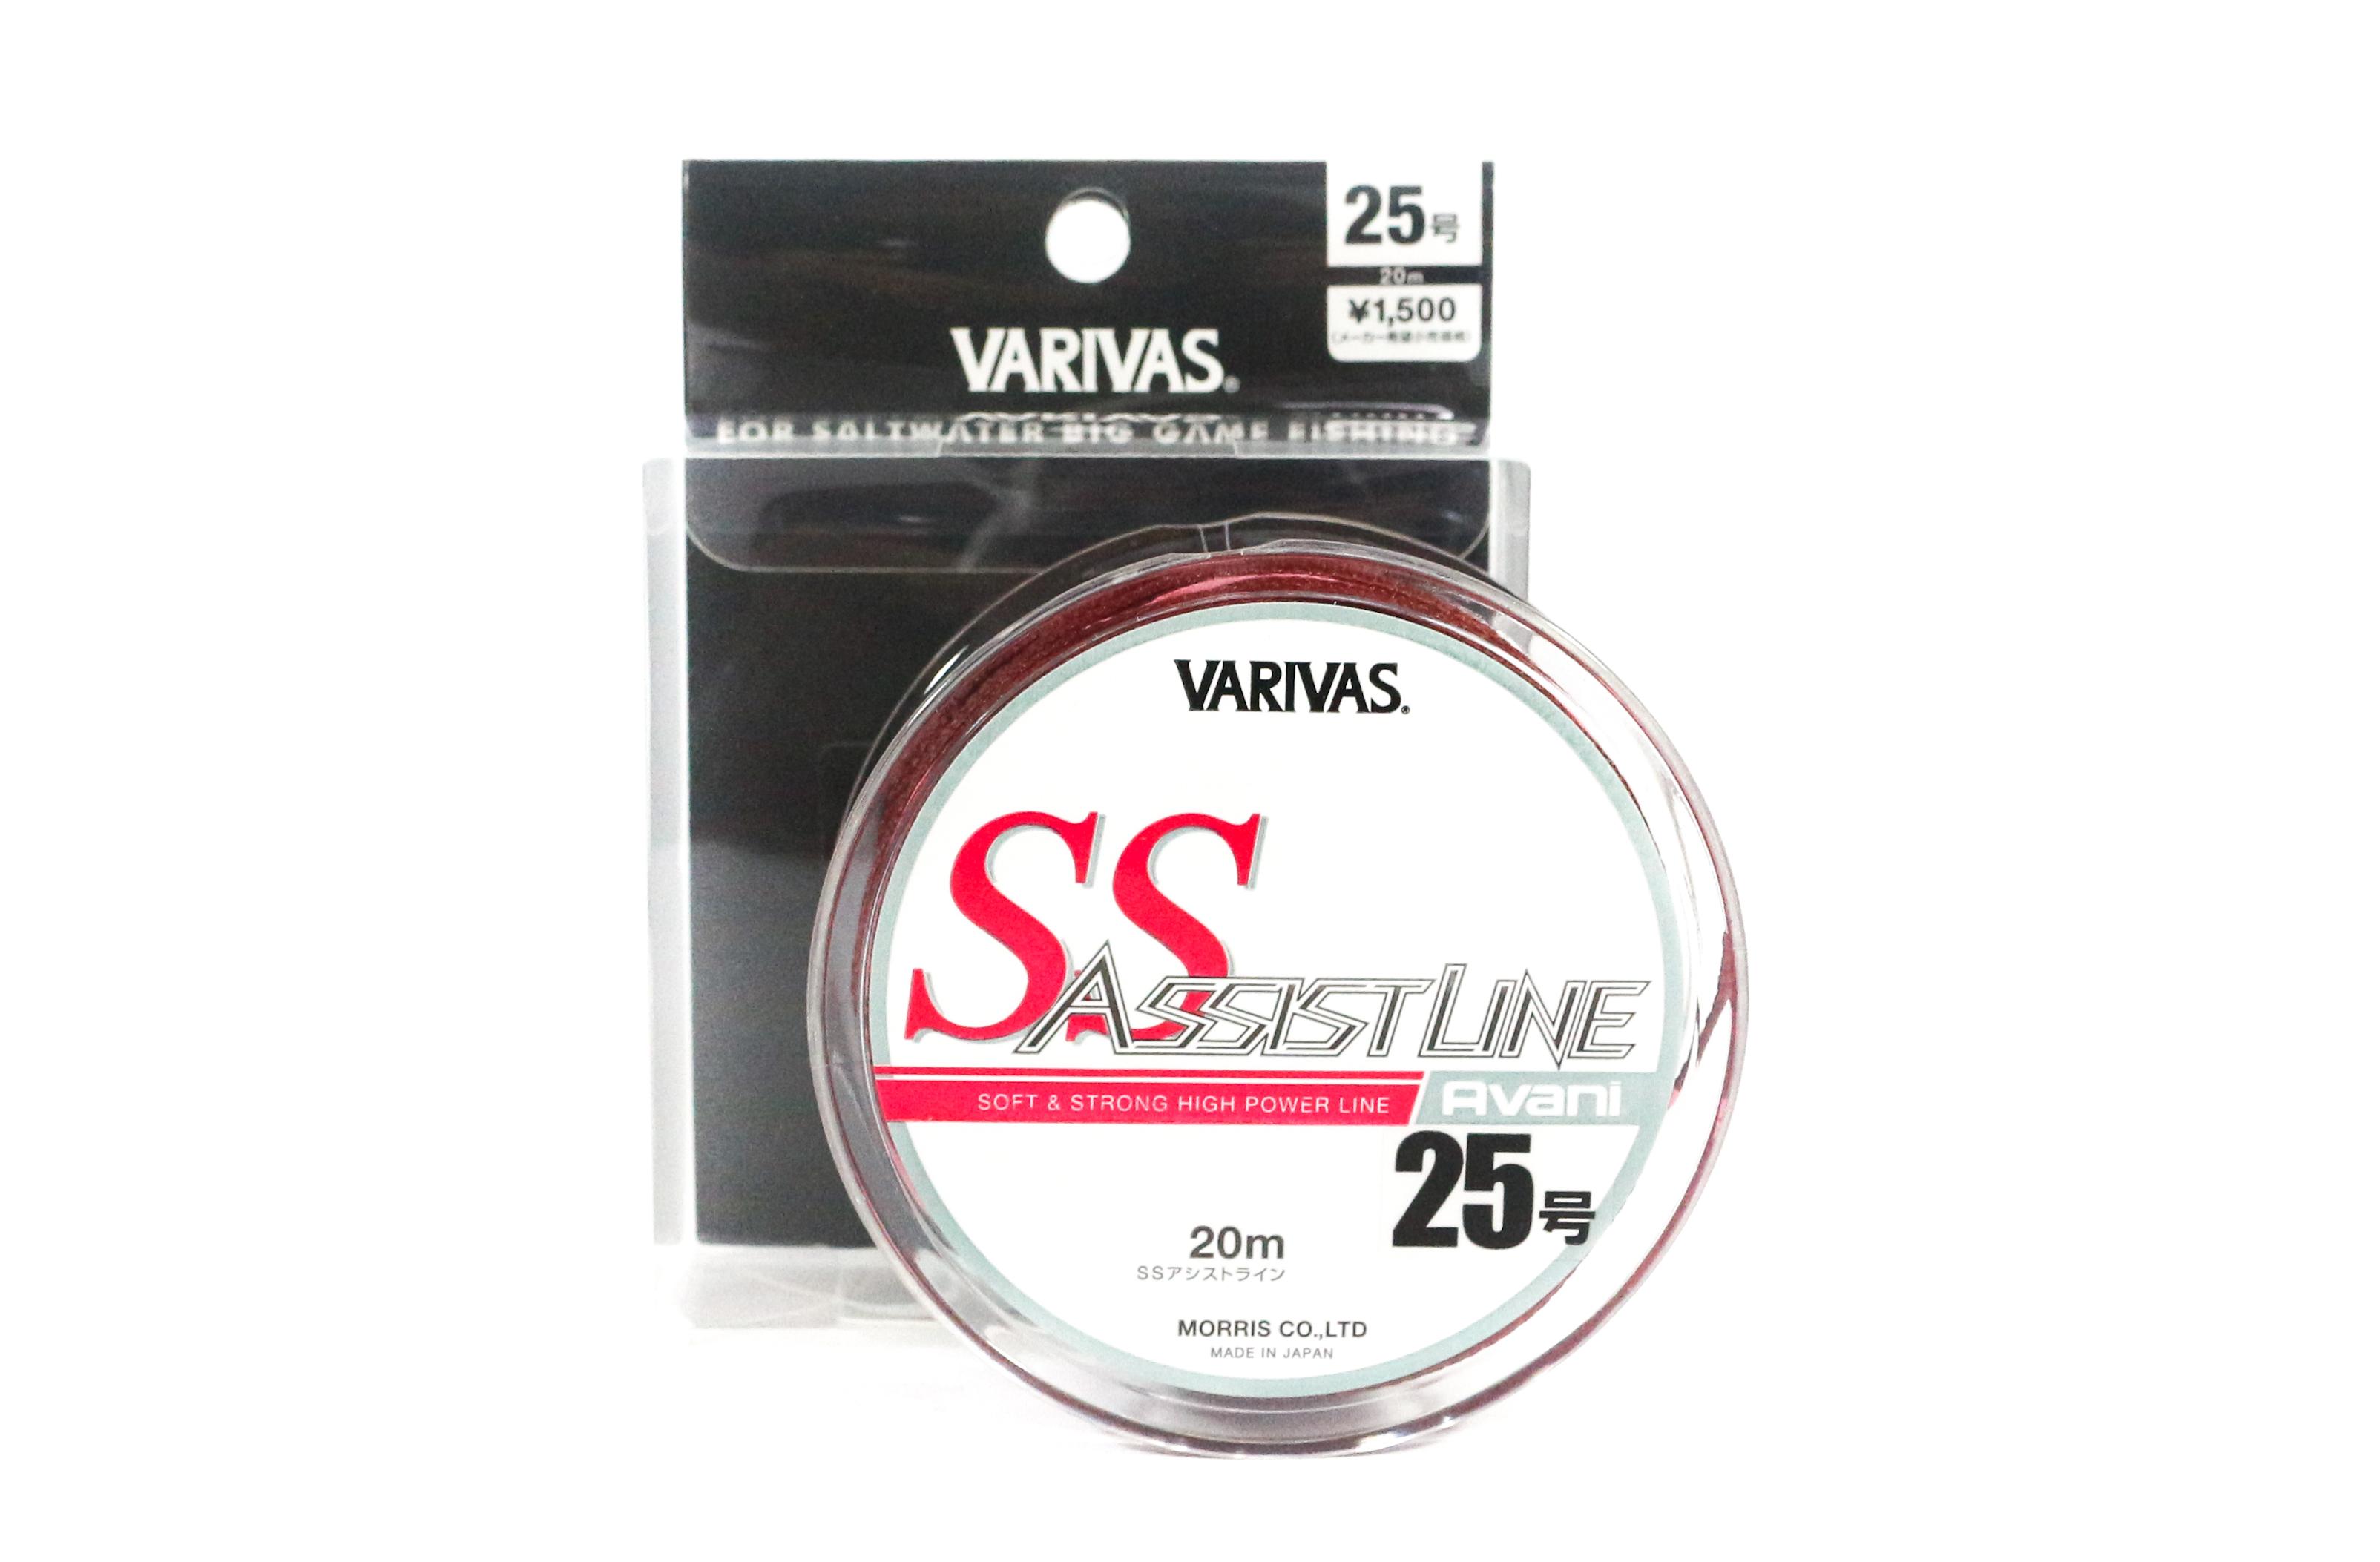 Varivas SS Assist Line 20m #25 130lb (3468)